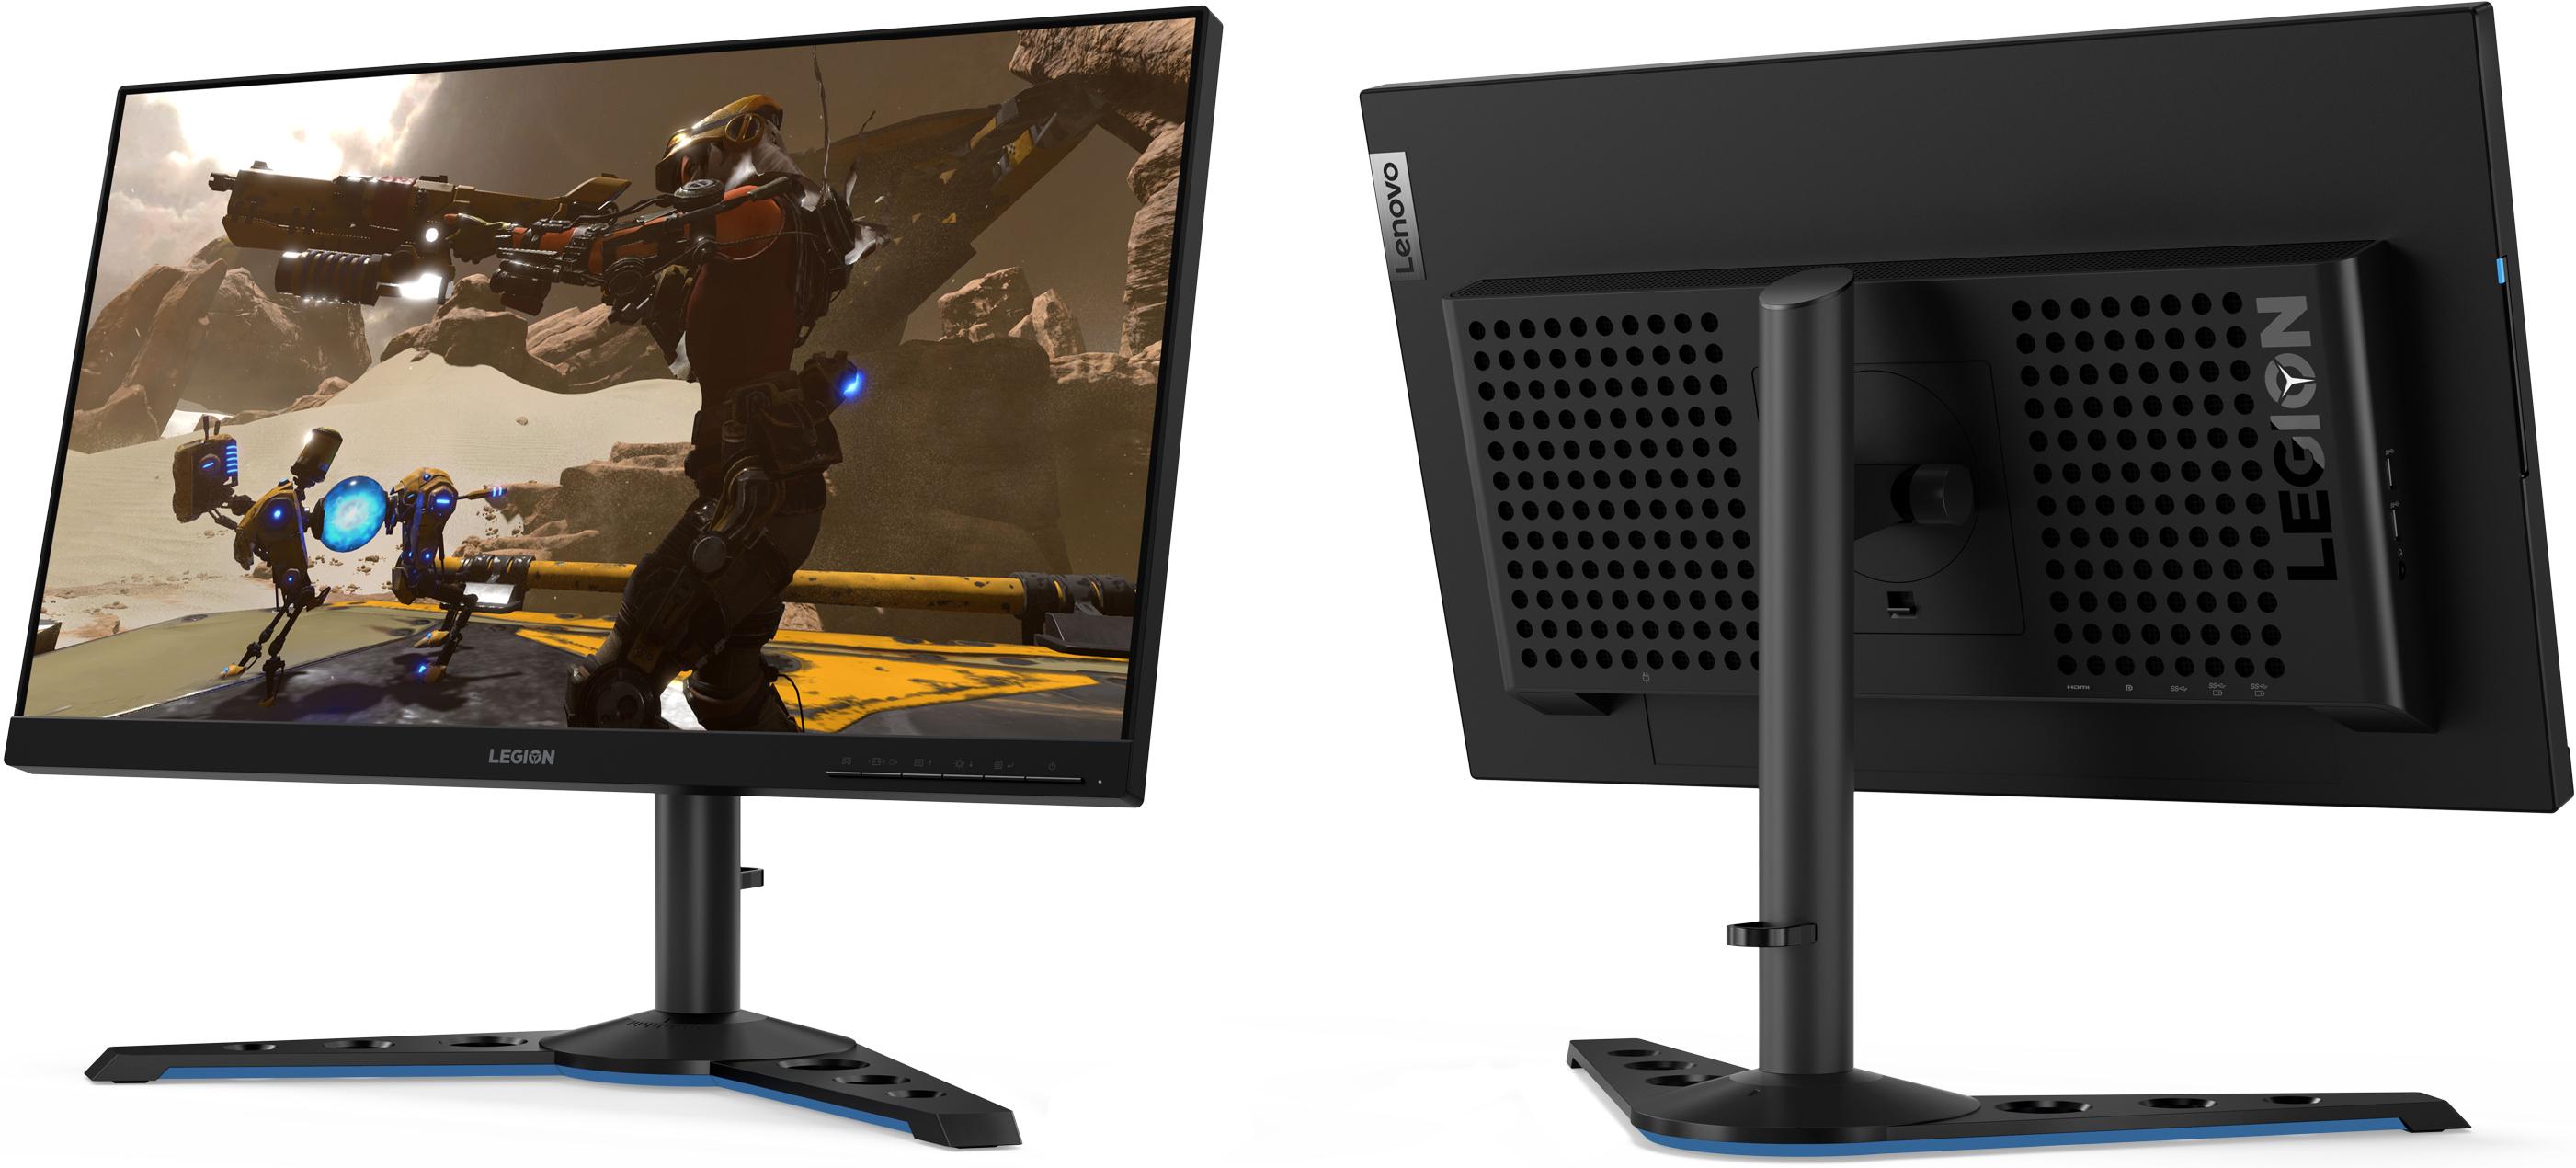 Gone in 240 Hz: Lenovo' Legion Y25-25 'Fast IPS' Monitor w/ FreeSync at CES 2020